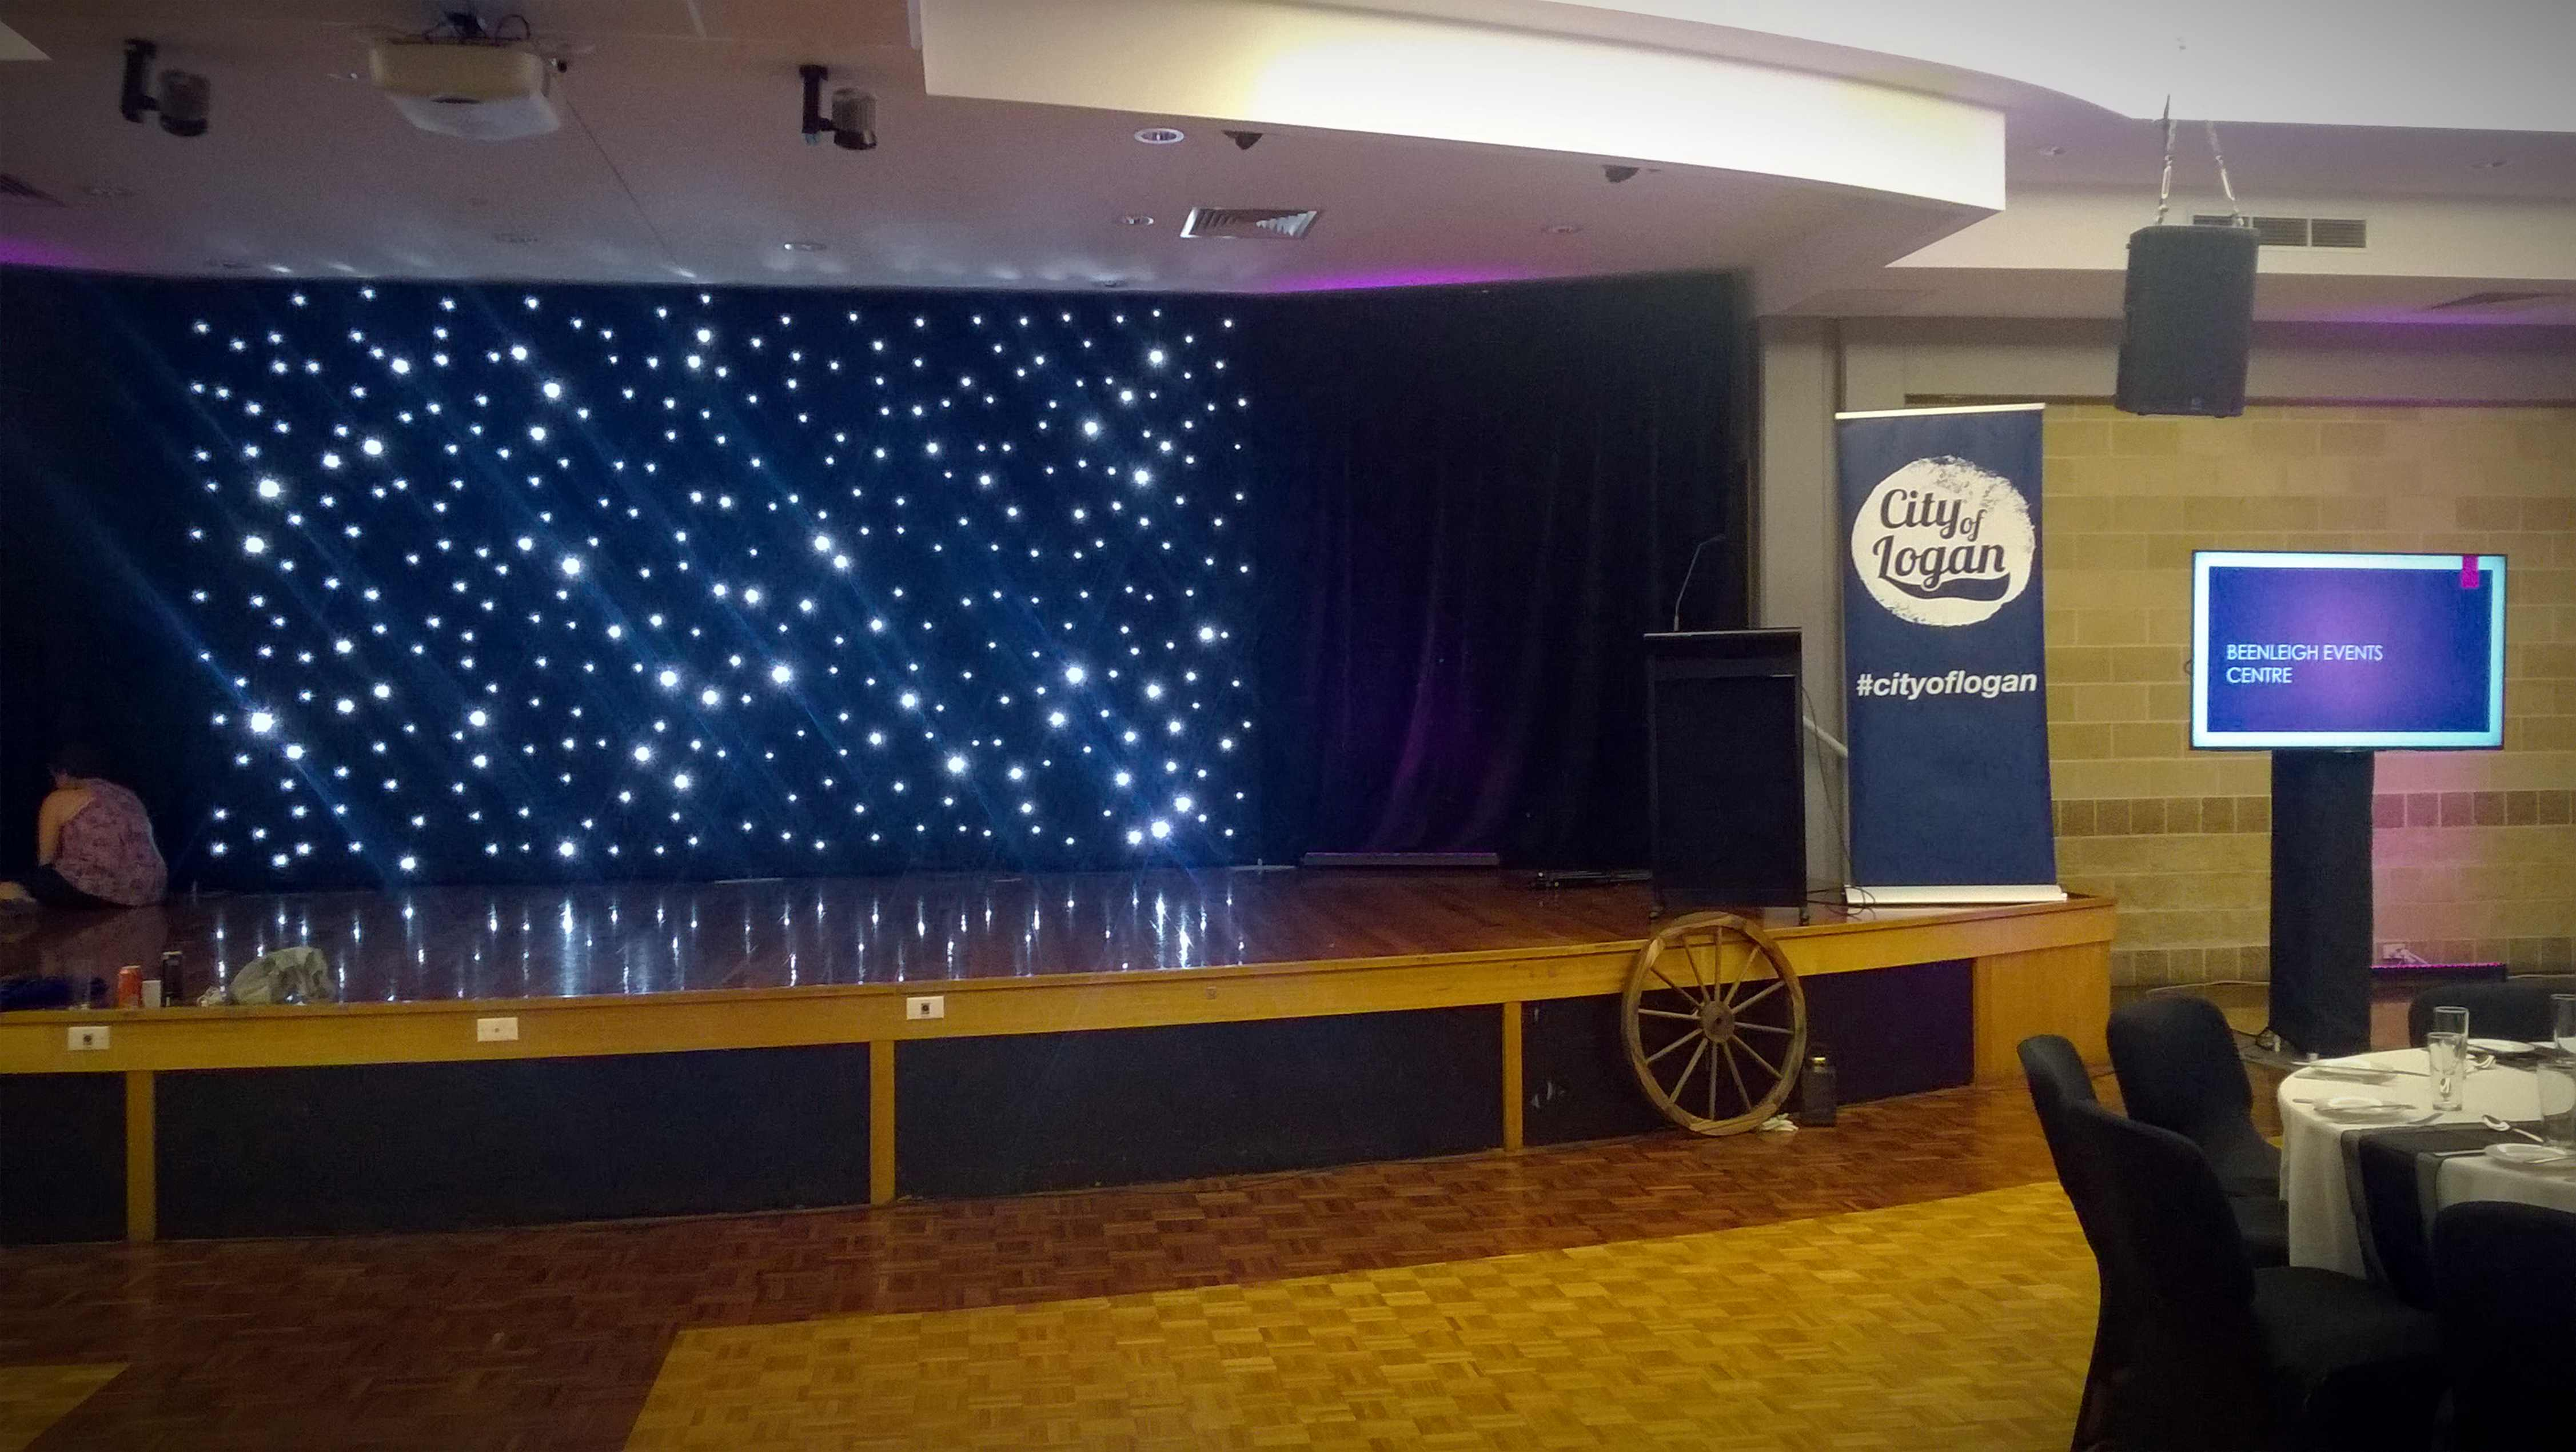 Star Curtain Beenleigh 150